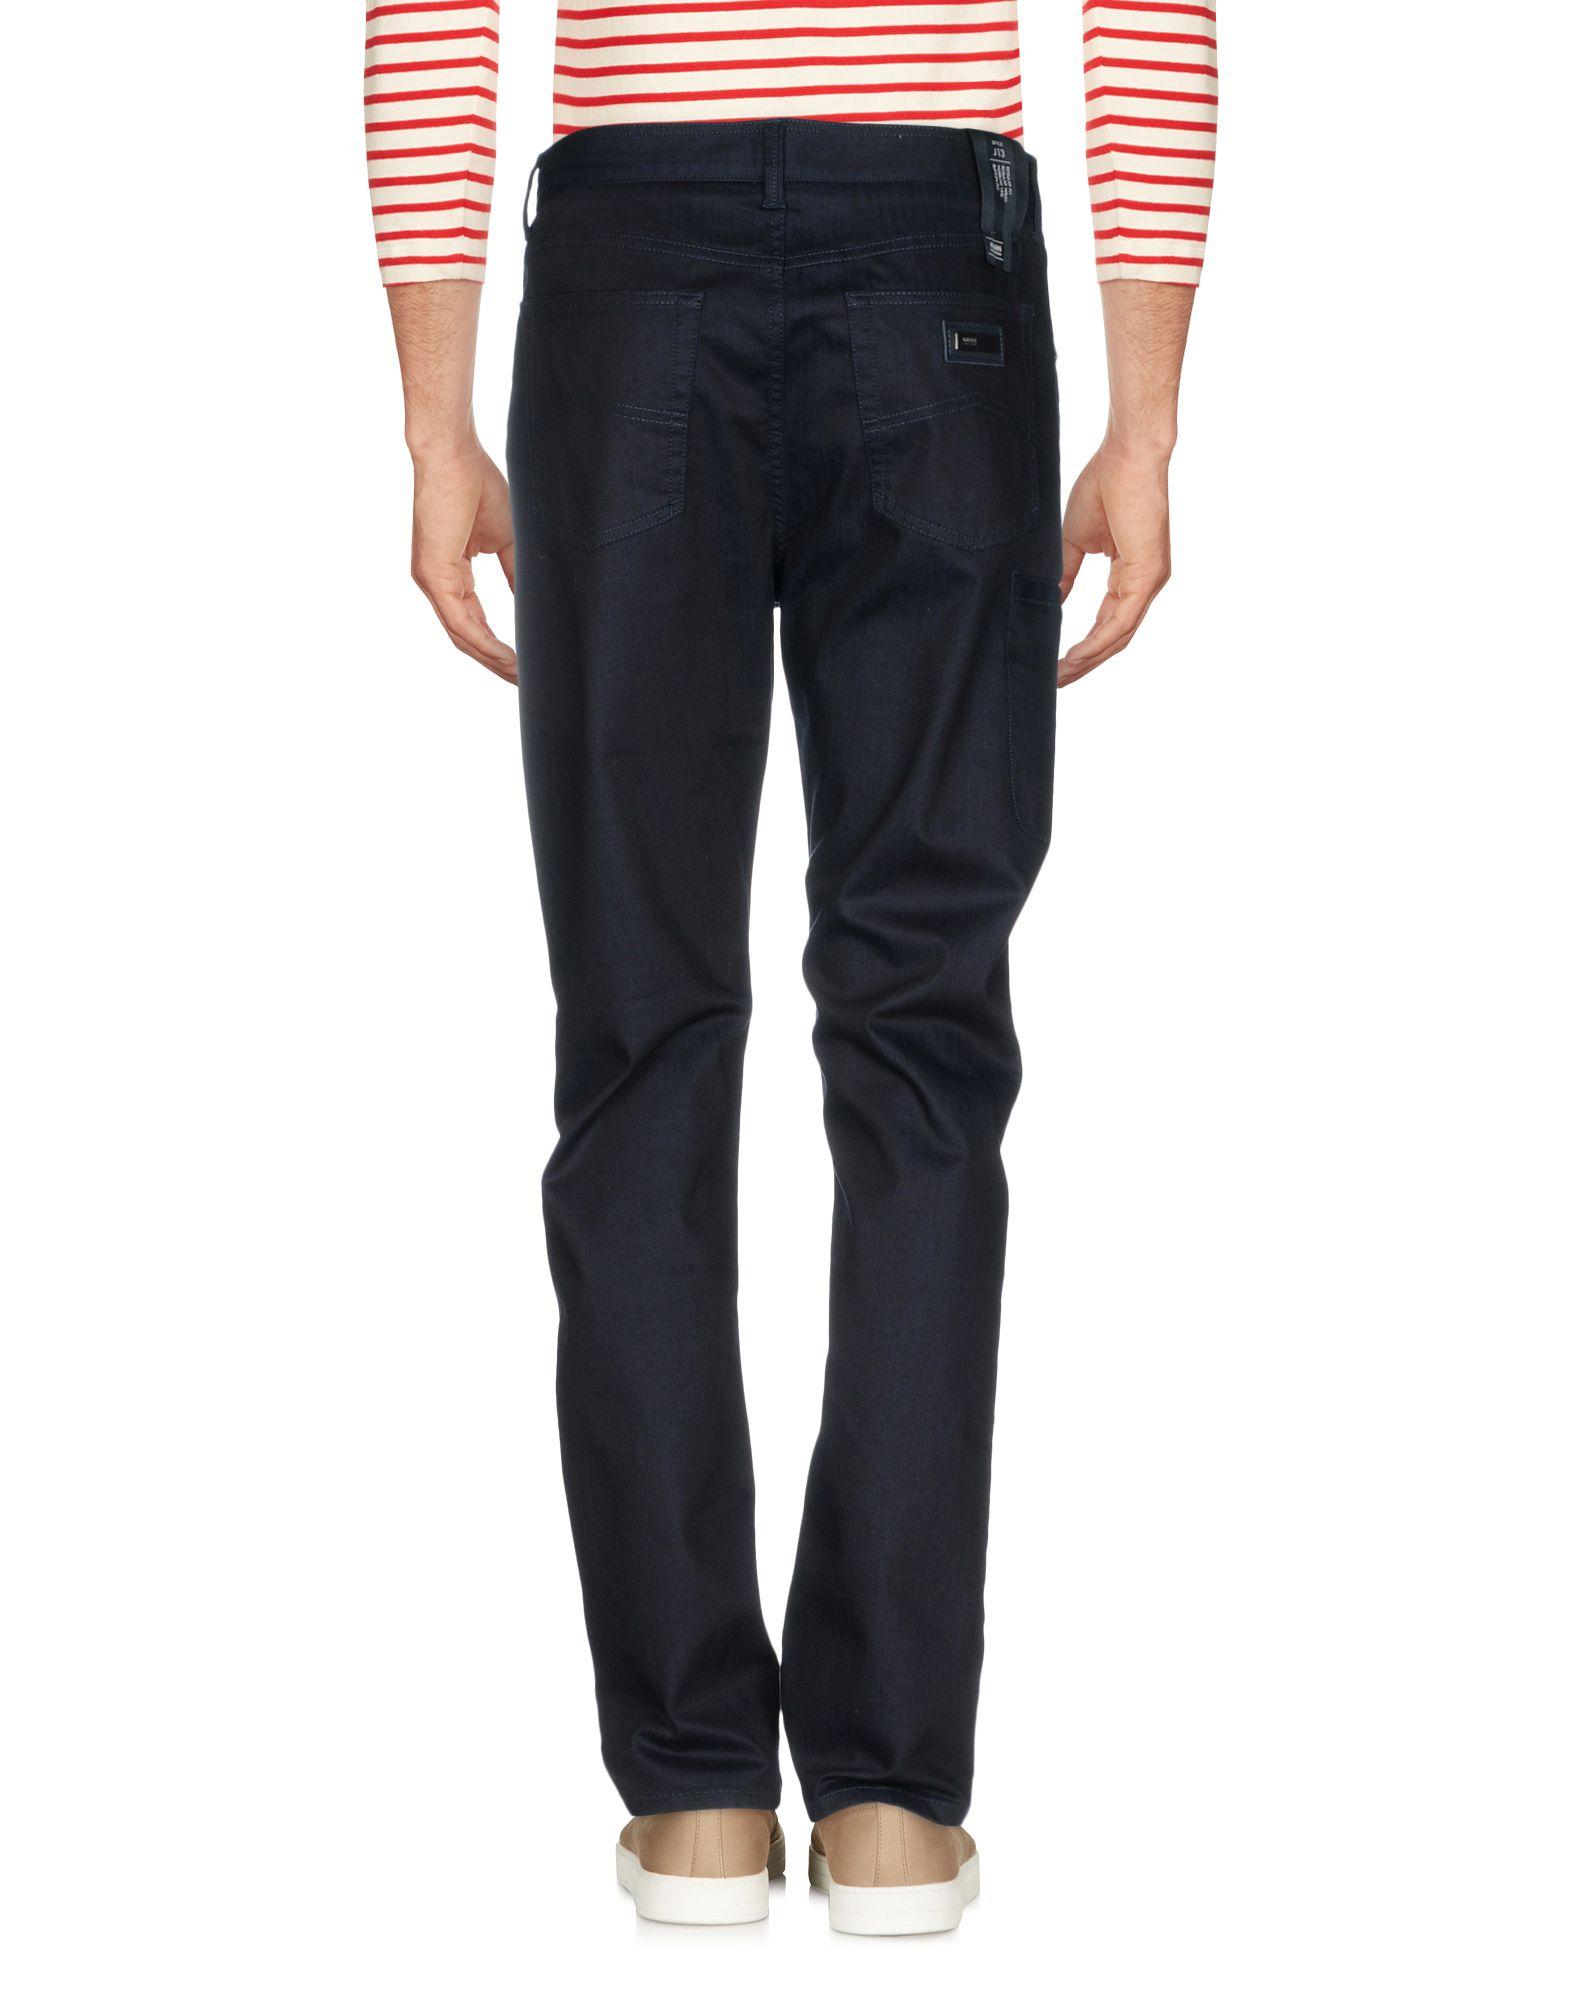 Pantaloni Pantaloni Pantaloni Jeans Armani Collezioni Uomo - 42659347HX 56cc2a